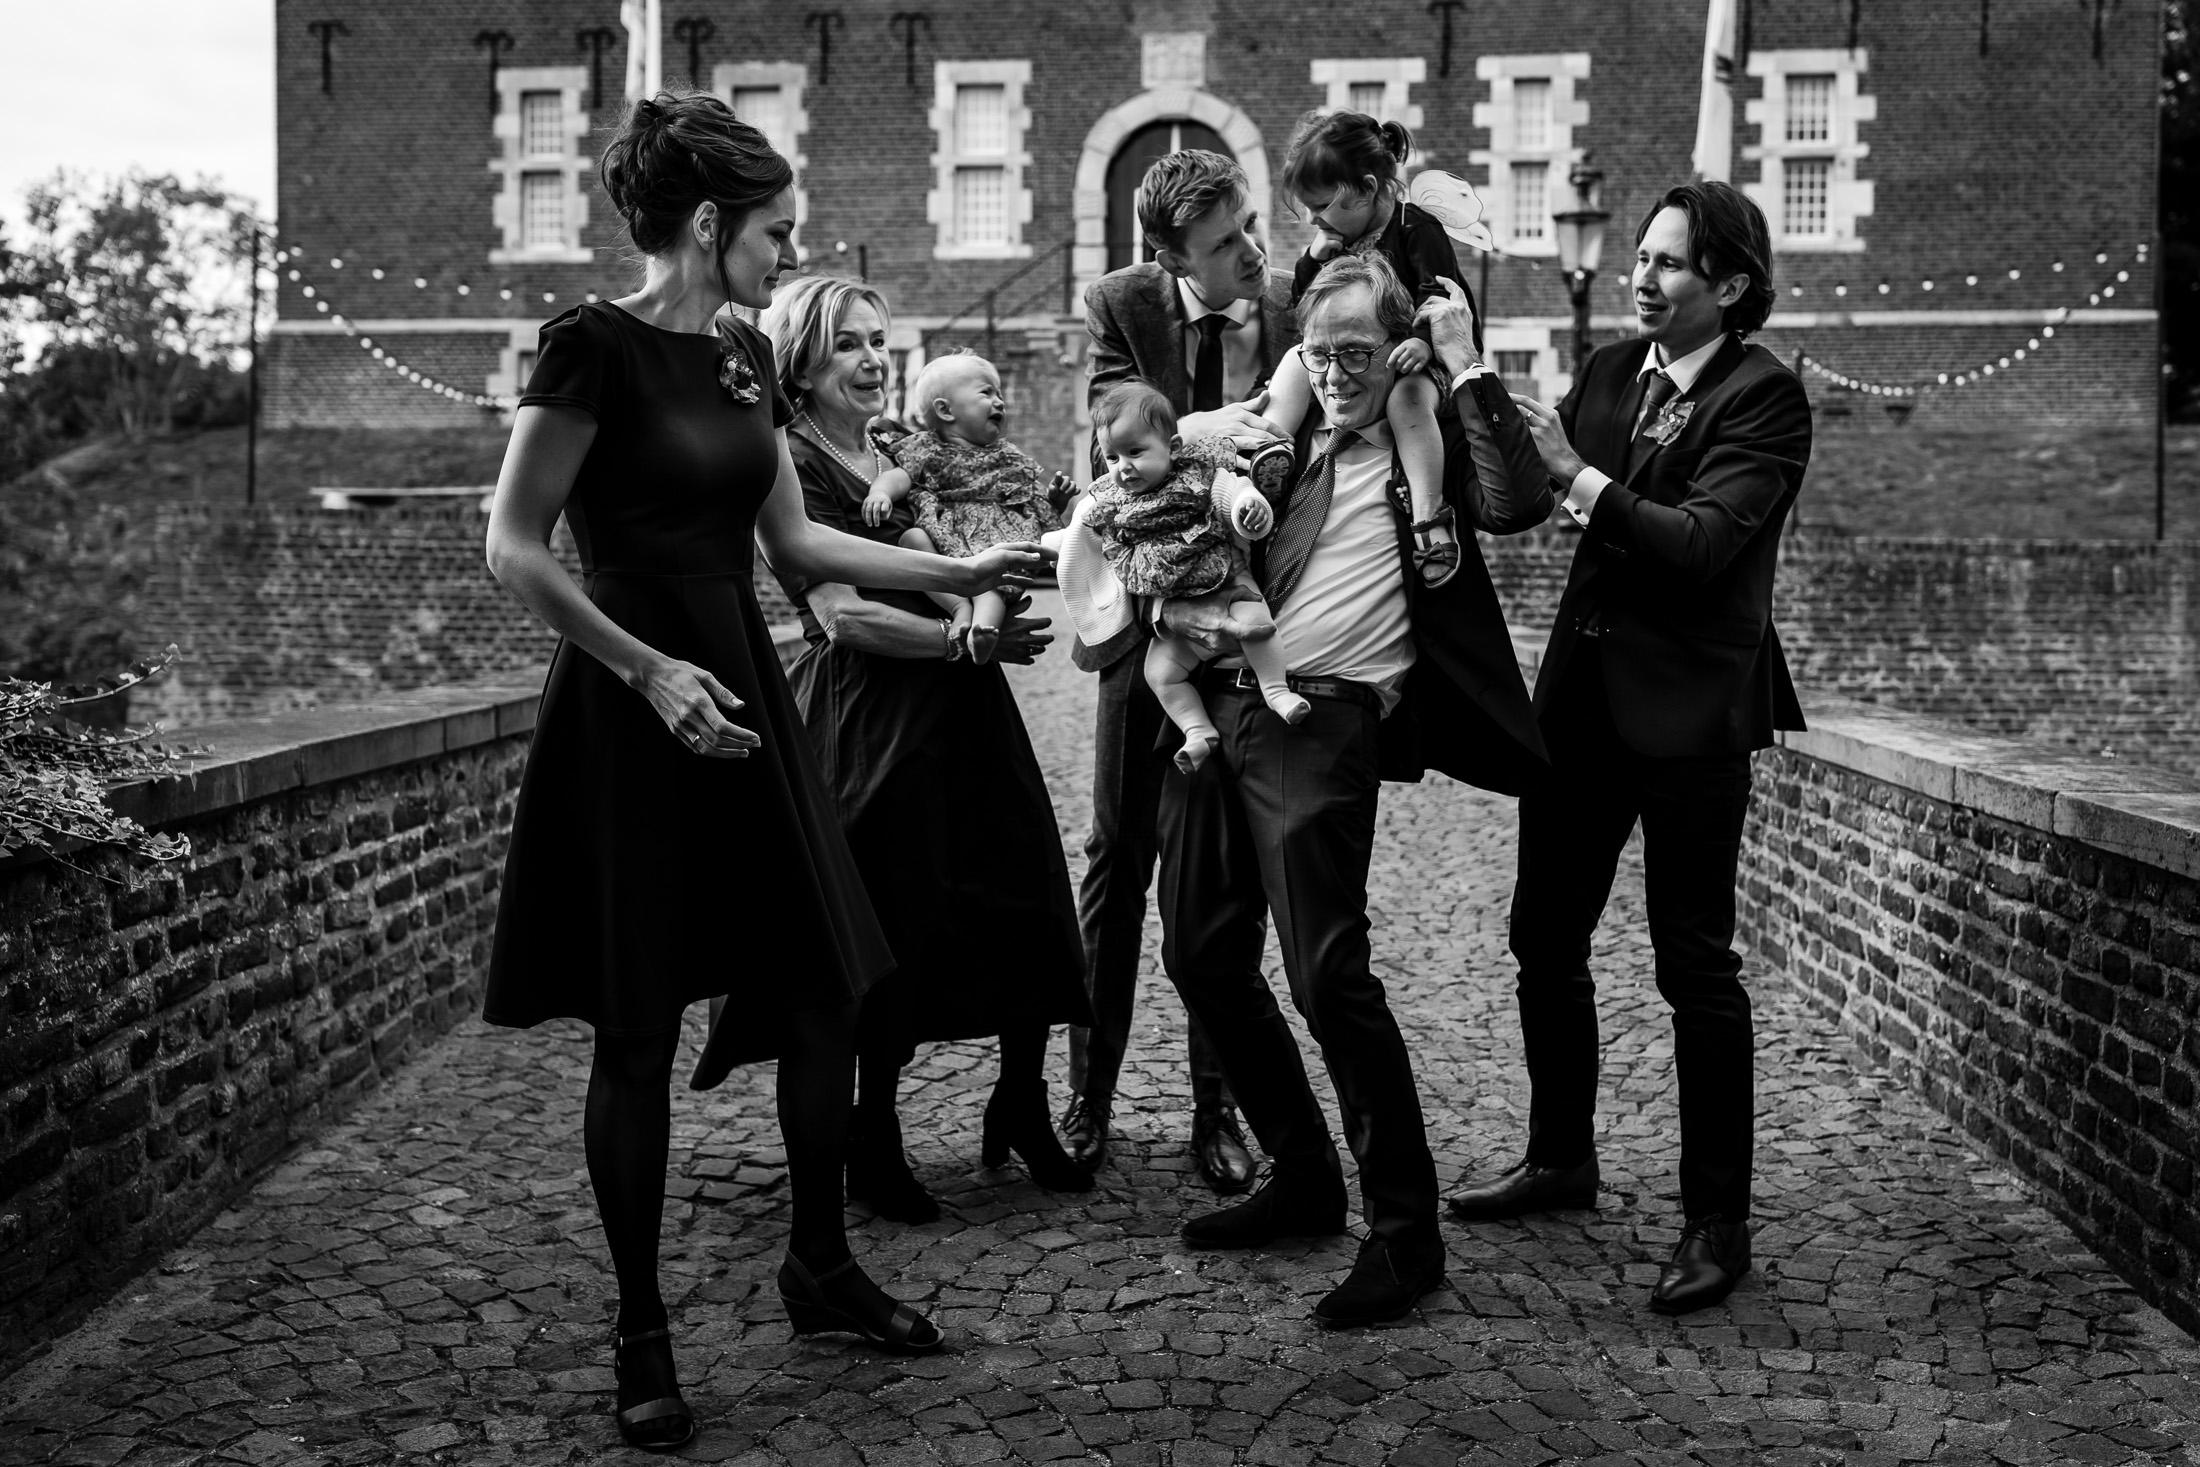 Trouwen bij Kasteel Limbricht   Trouwen in Limburg   Trouwfotograaf Limburg   Groepsfoto bruiloft